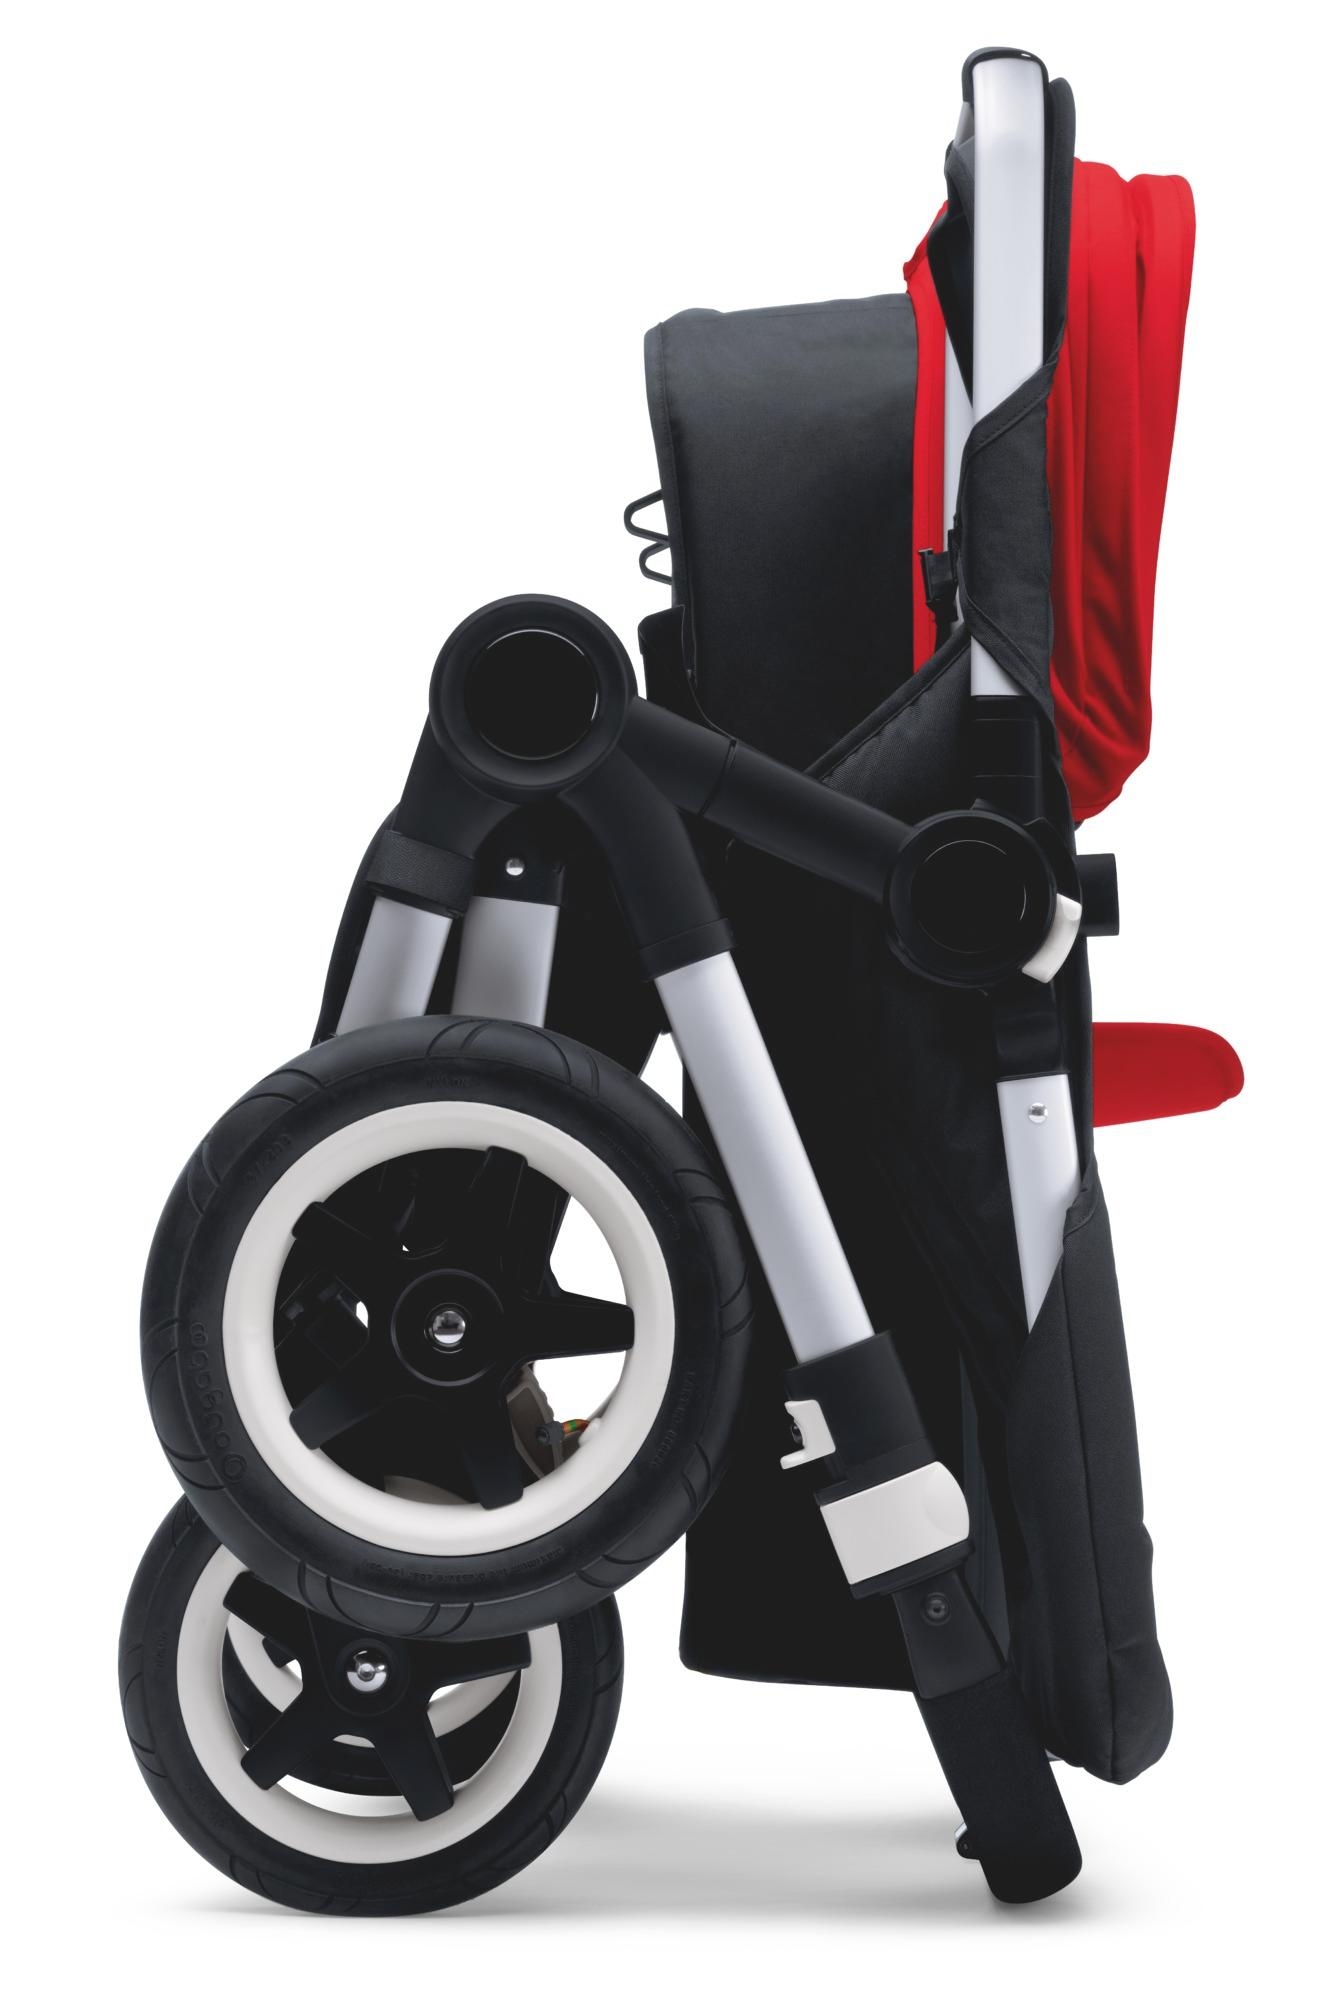 Amazon.com : Bugaboo 2015 Donkey Base Stroller, Alu/Blk : Baby